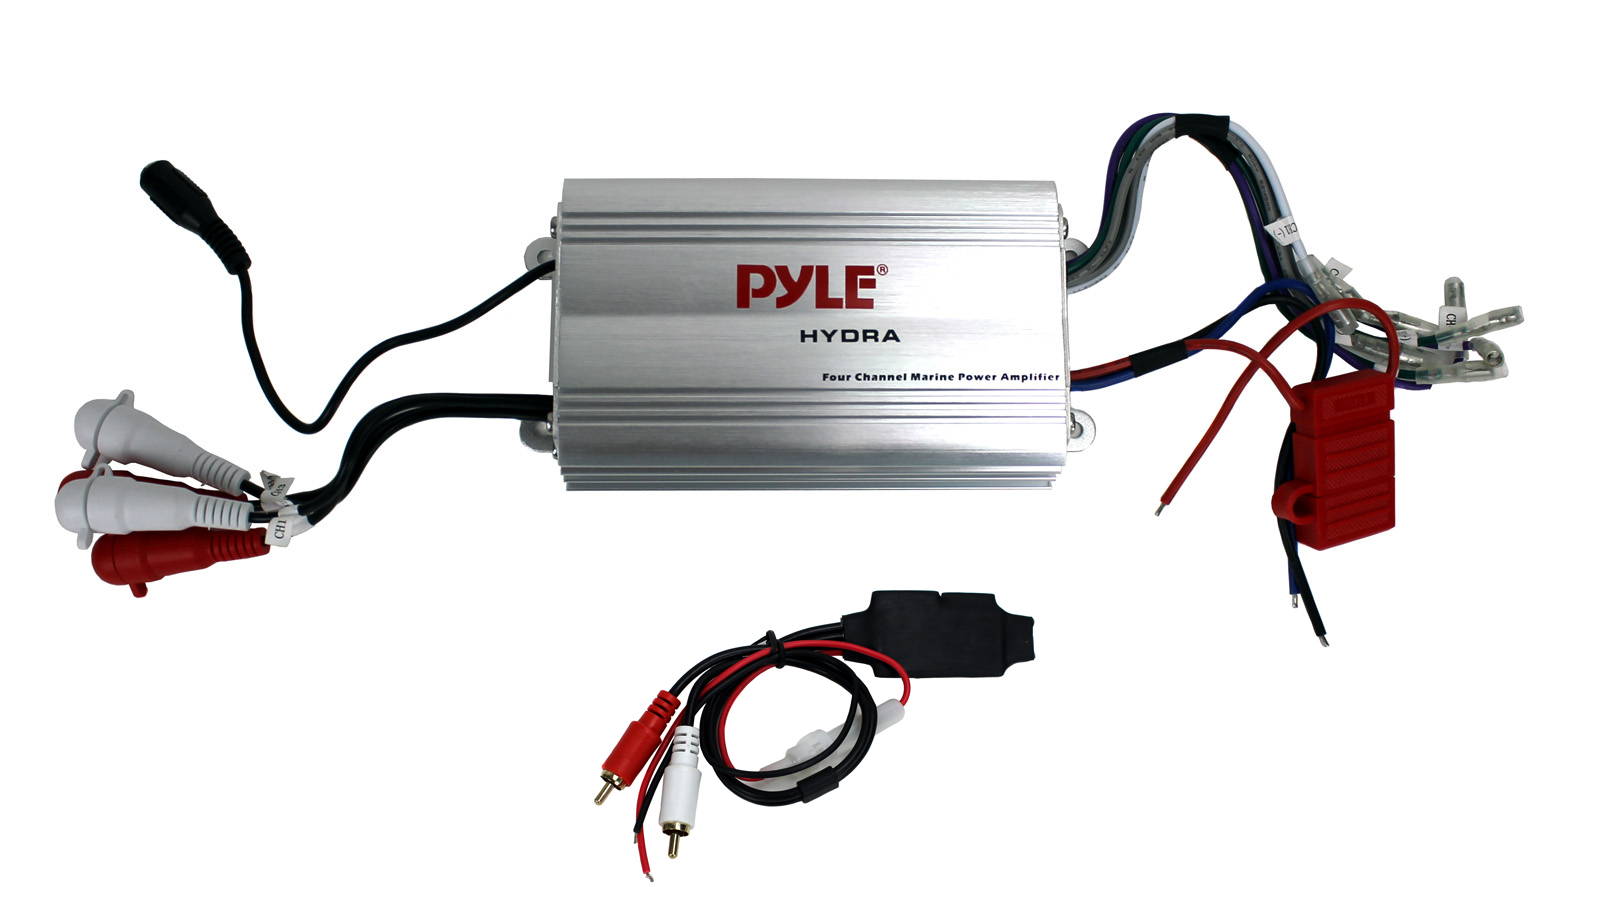 medium resolution of pyle plmrmp3a 4 channel marine waterproof mp3 ipod amplifier pyle plmrmp3a wiring diagram